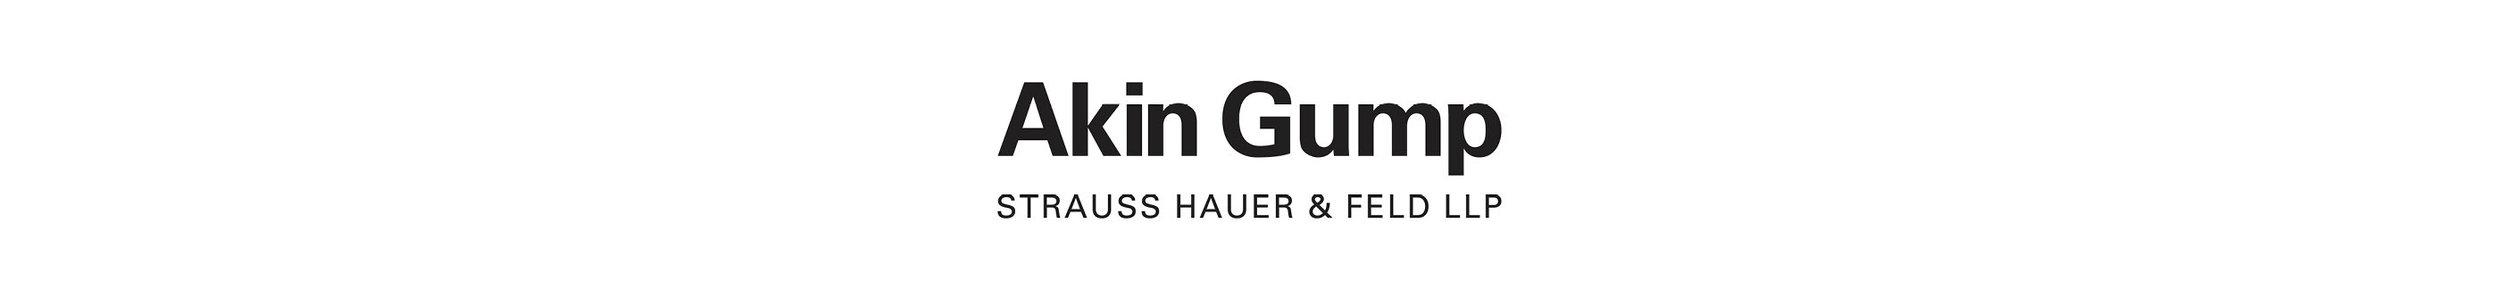 gump (1).jpg